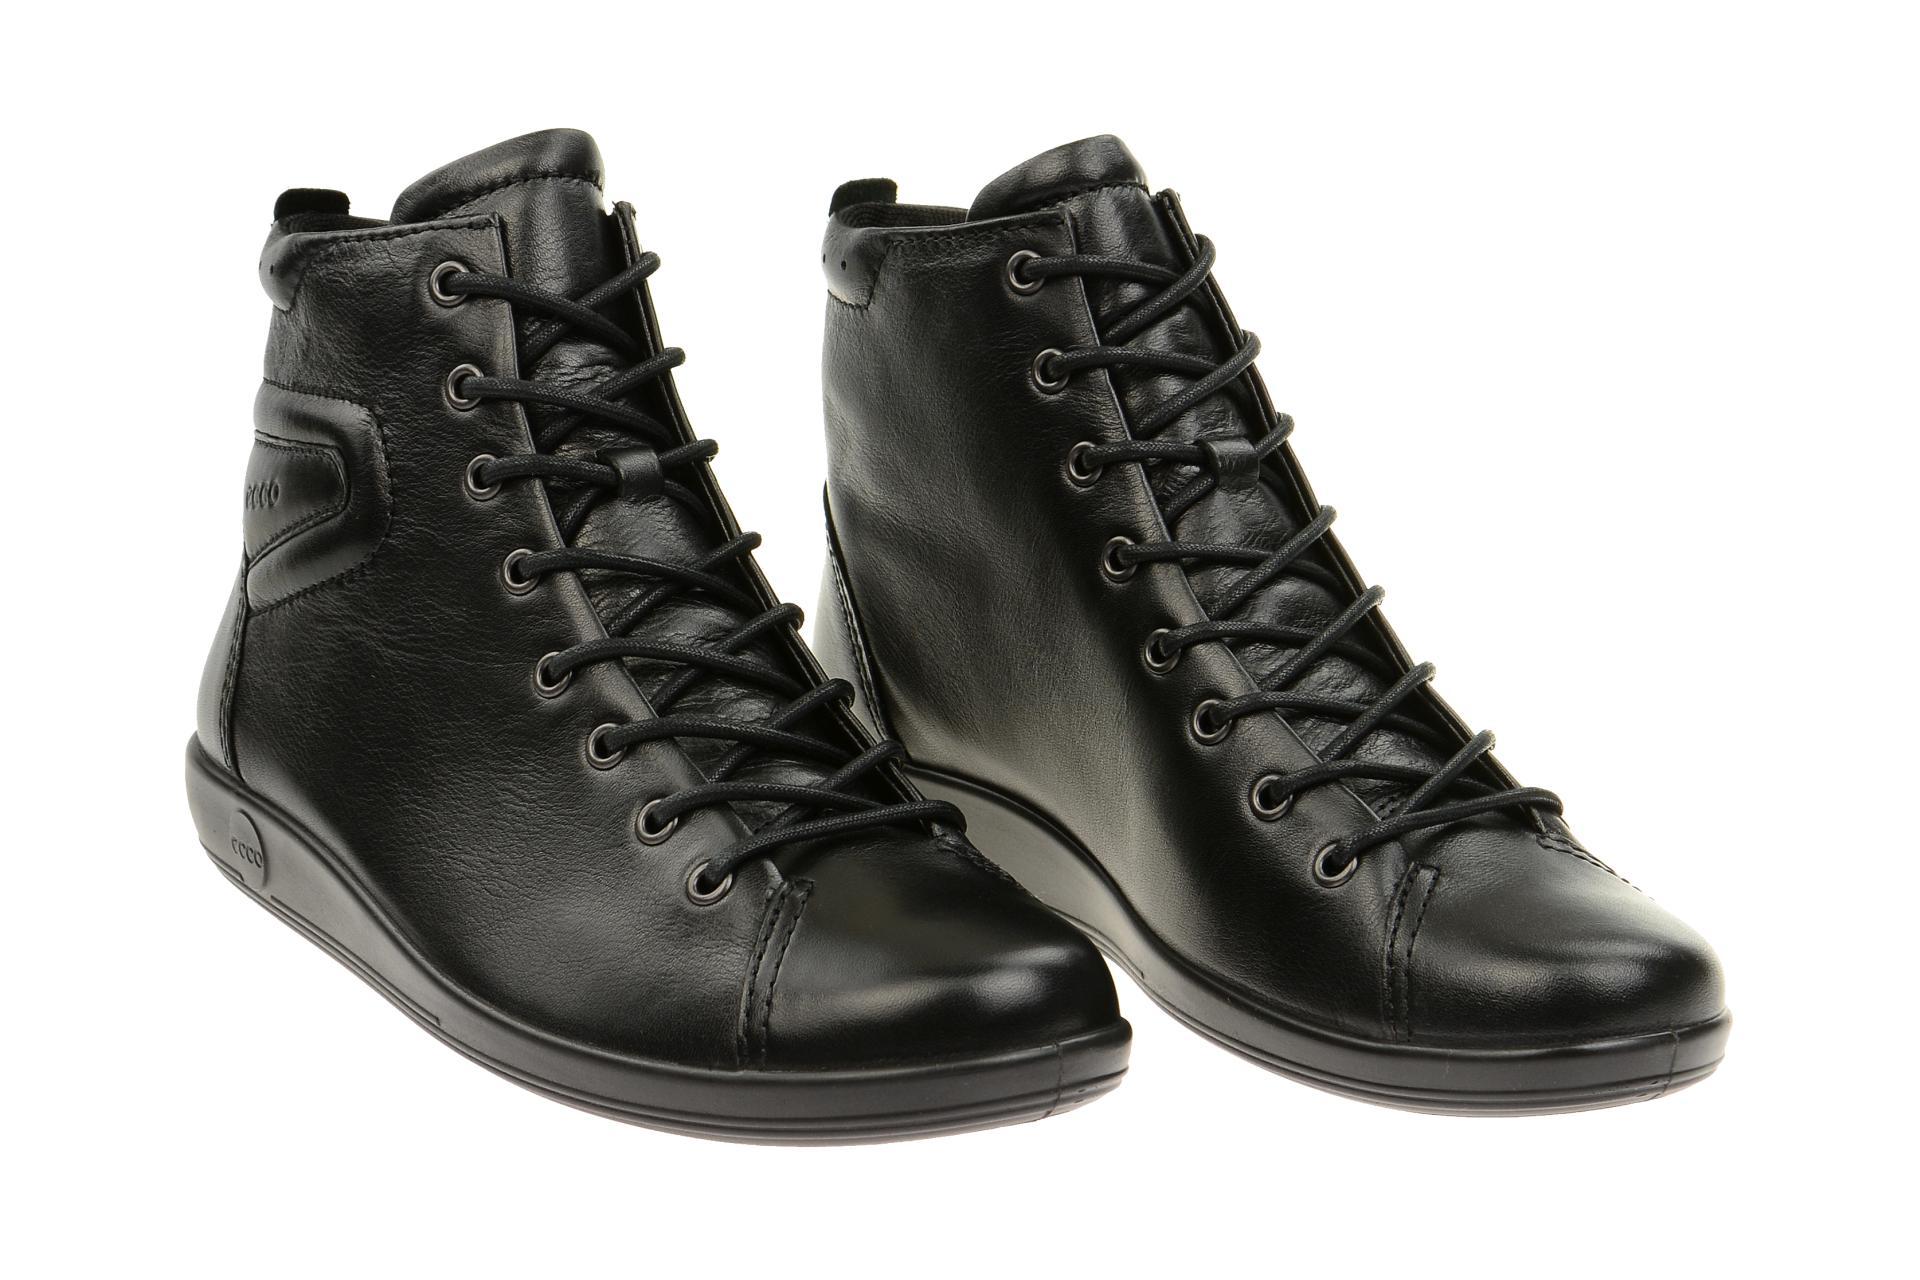 a24918942a445b Ecco Schuhe SOFT 2.0 schwarz Damen Stiefeletten bequeme Stiefelette  20652356723